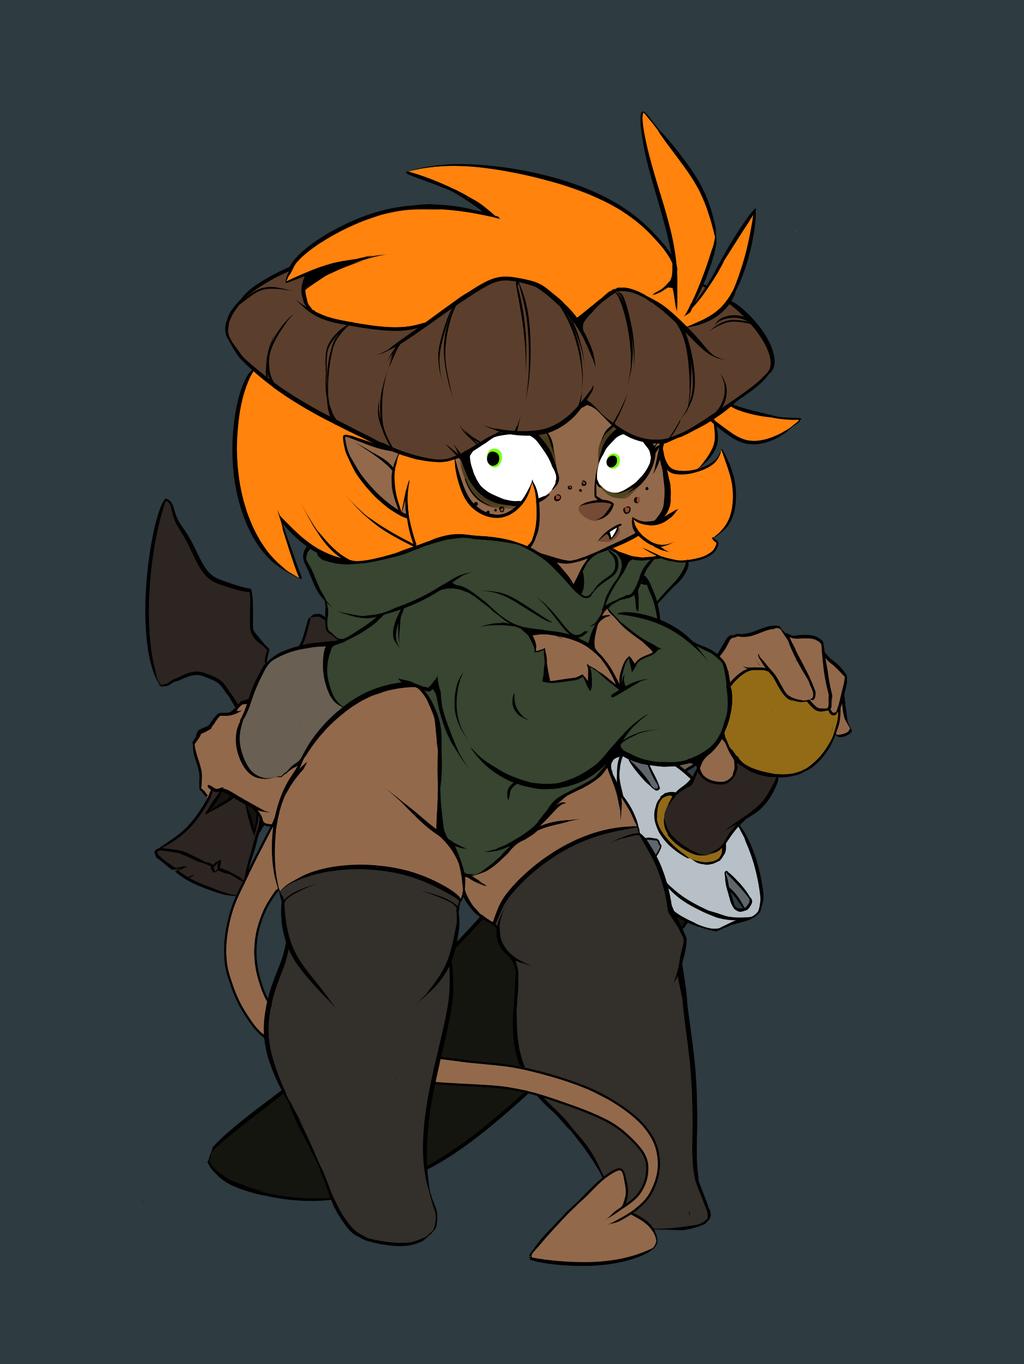 Pathfinder: Armella the Tiny Tiefling